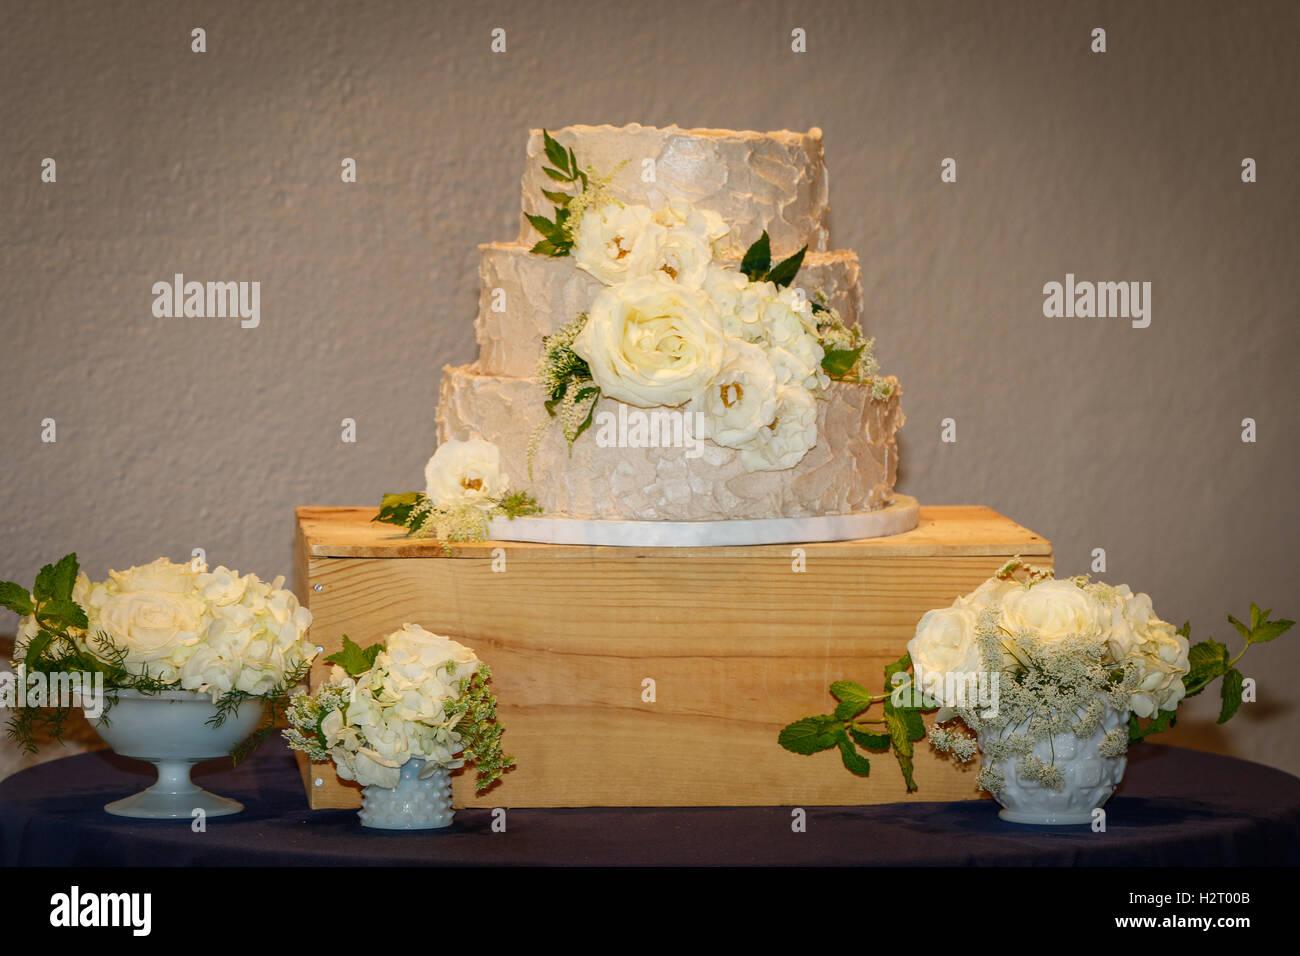 Simple White Wedding Cake Stock Photo 122228747 Alamy